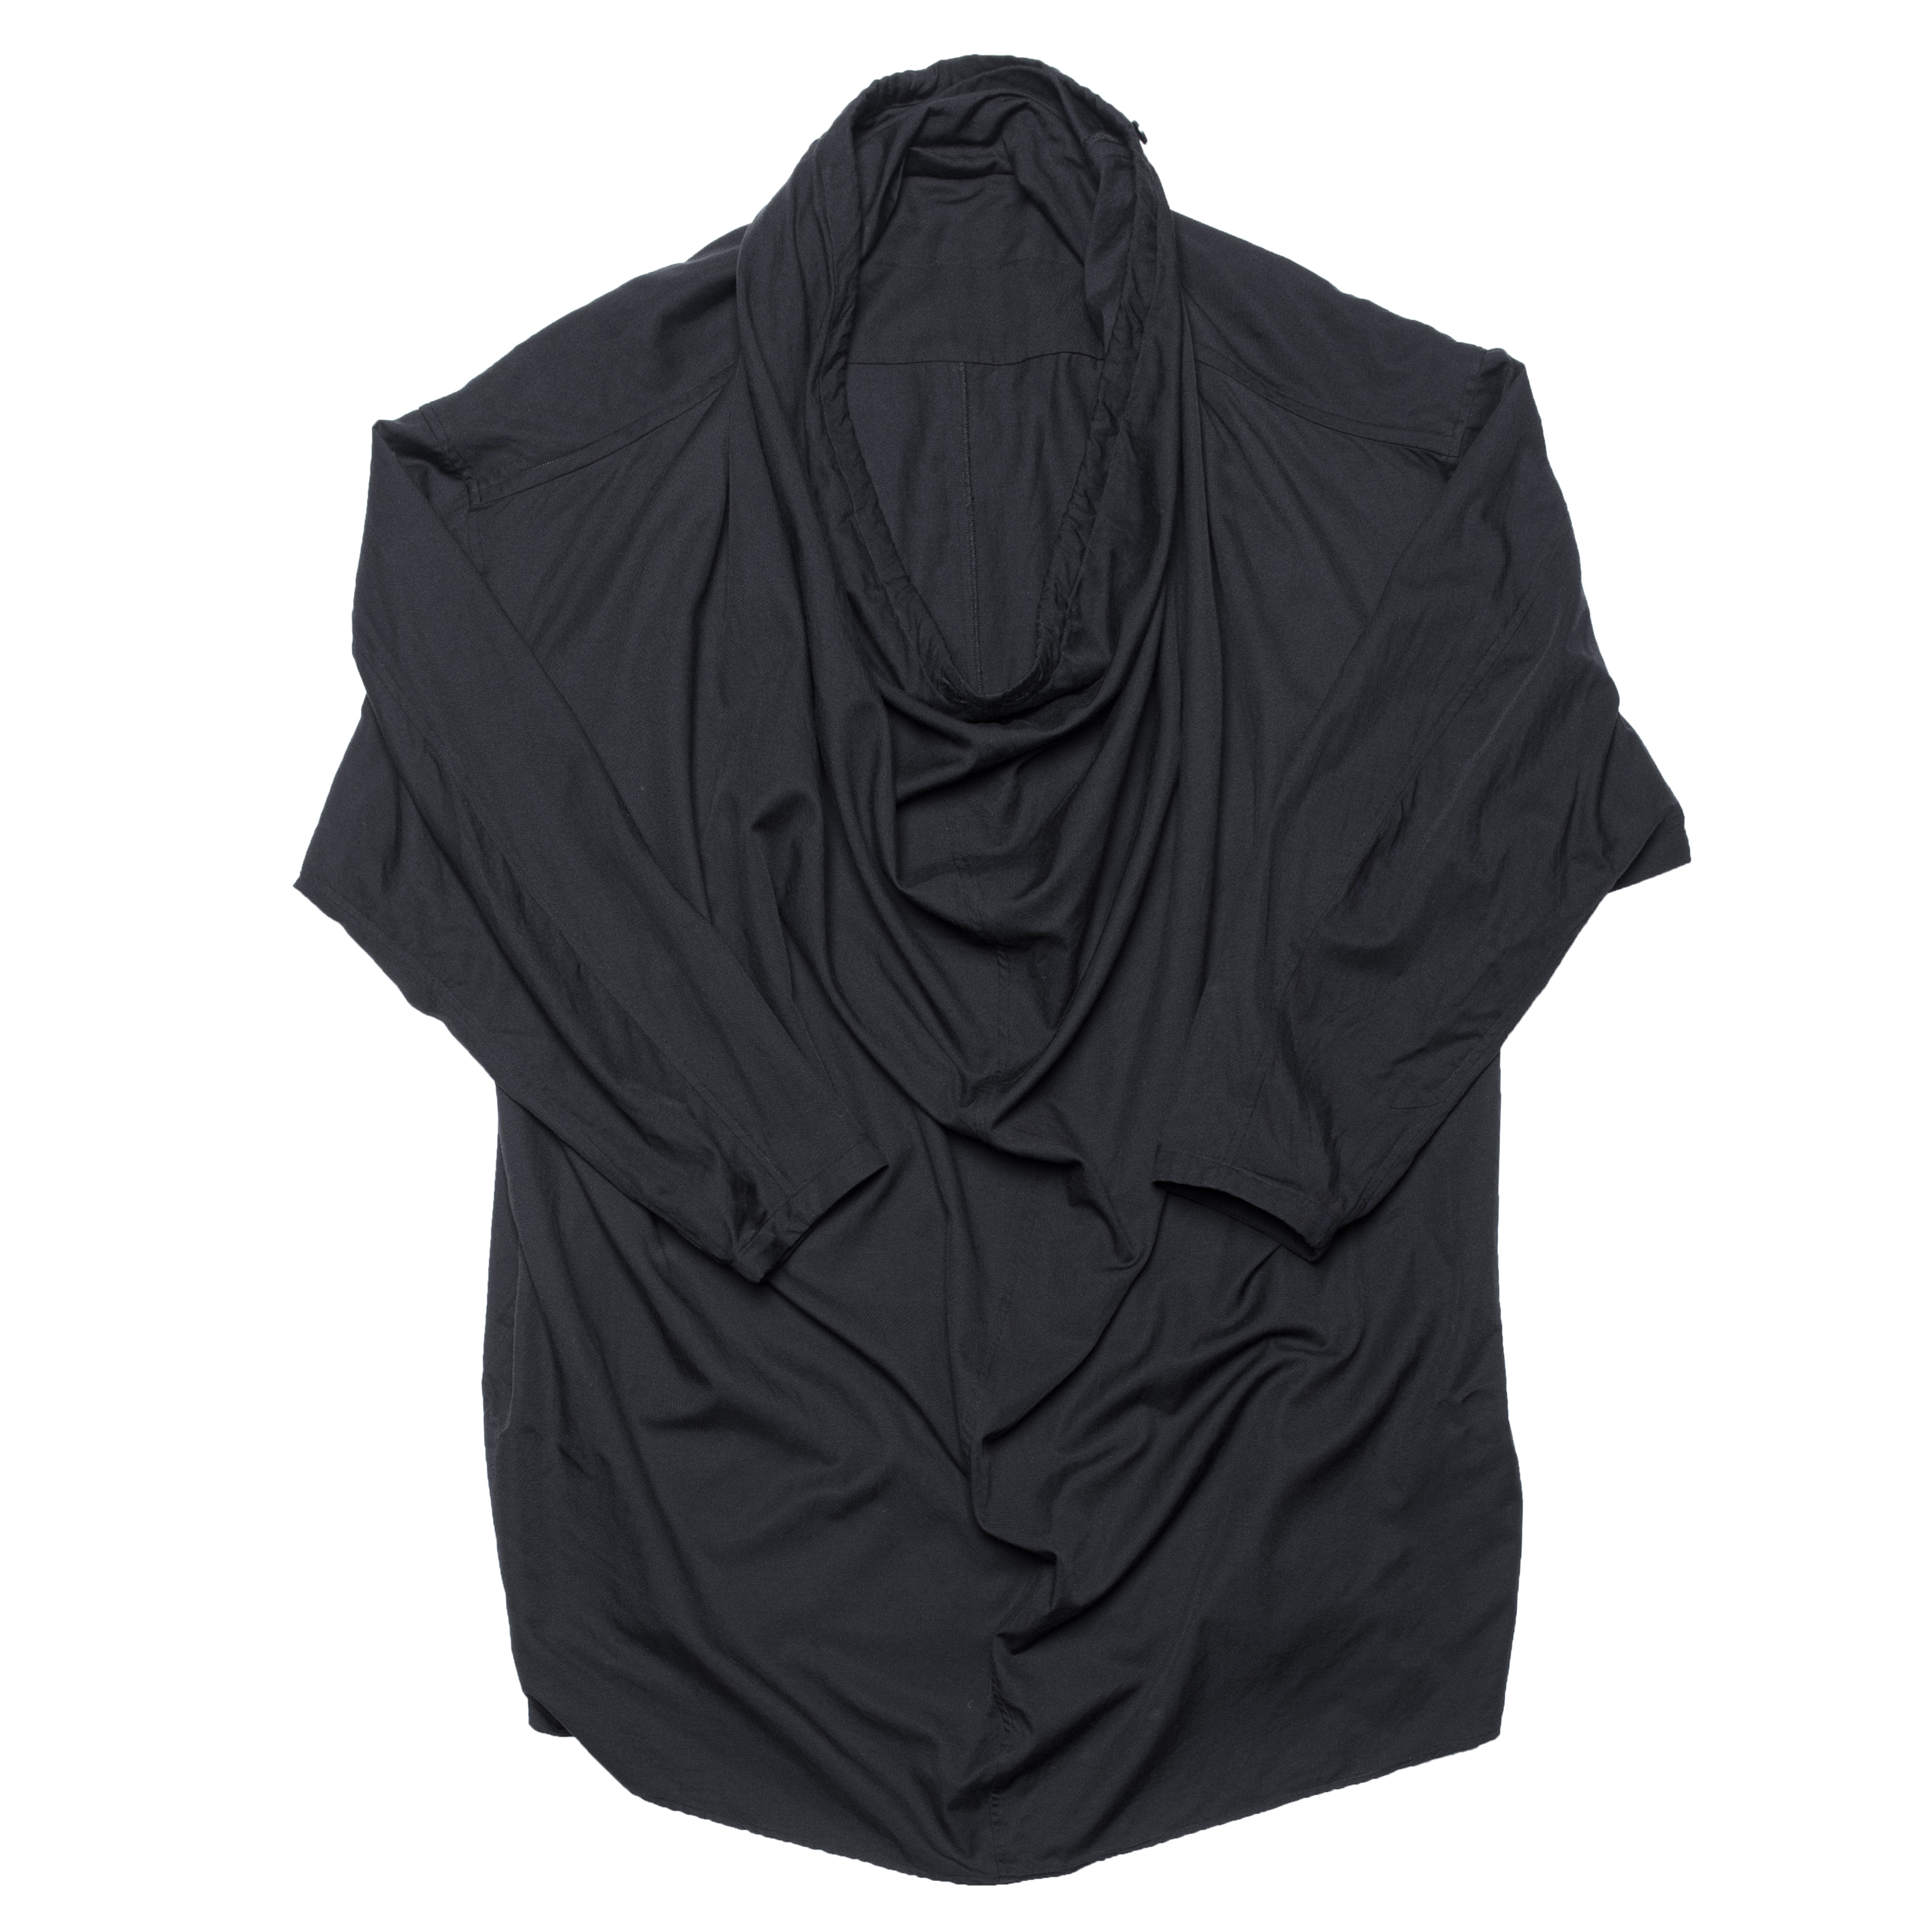 687SHM3-BLACK / ドレープネックシャツ